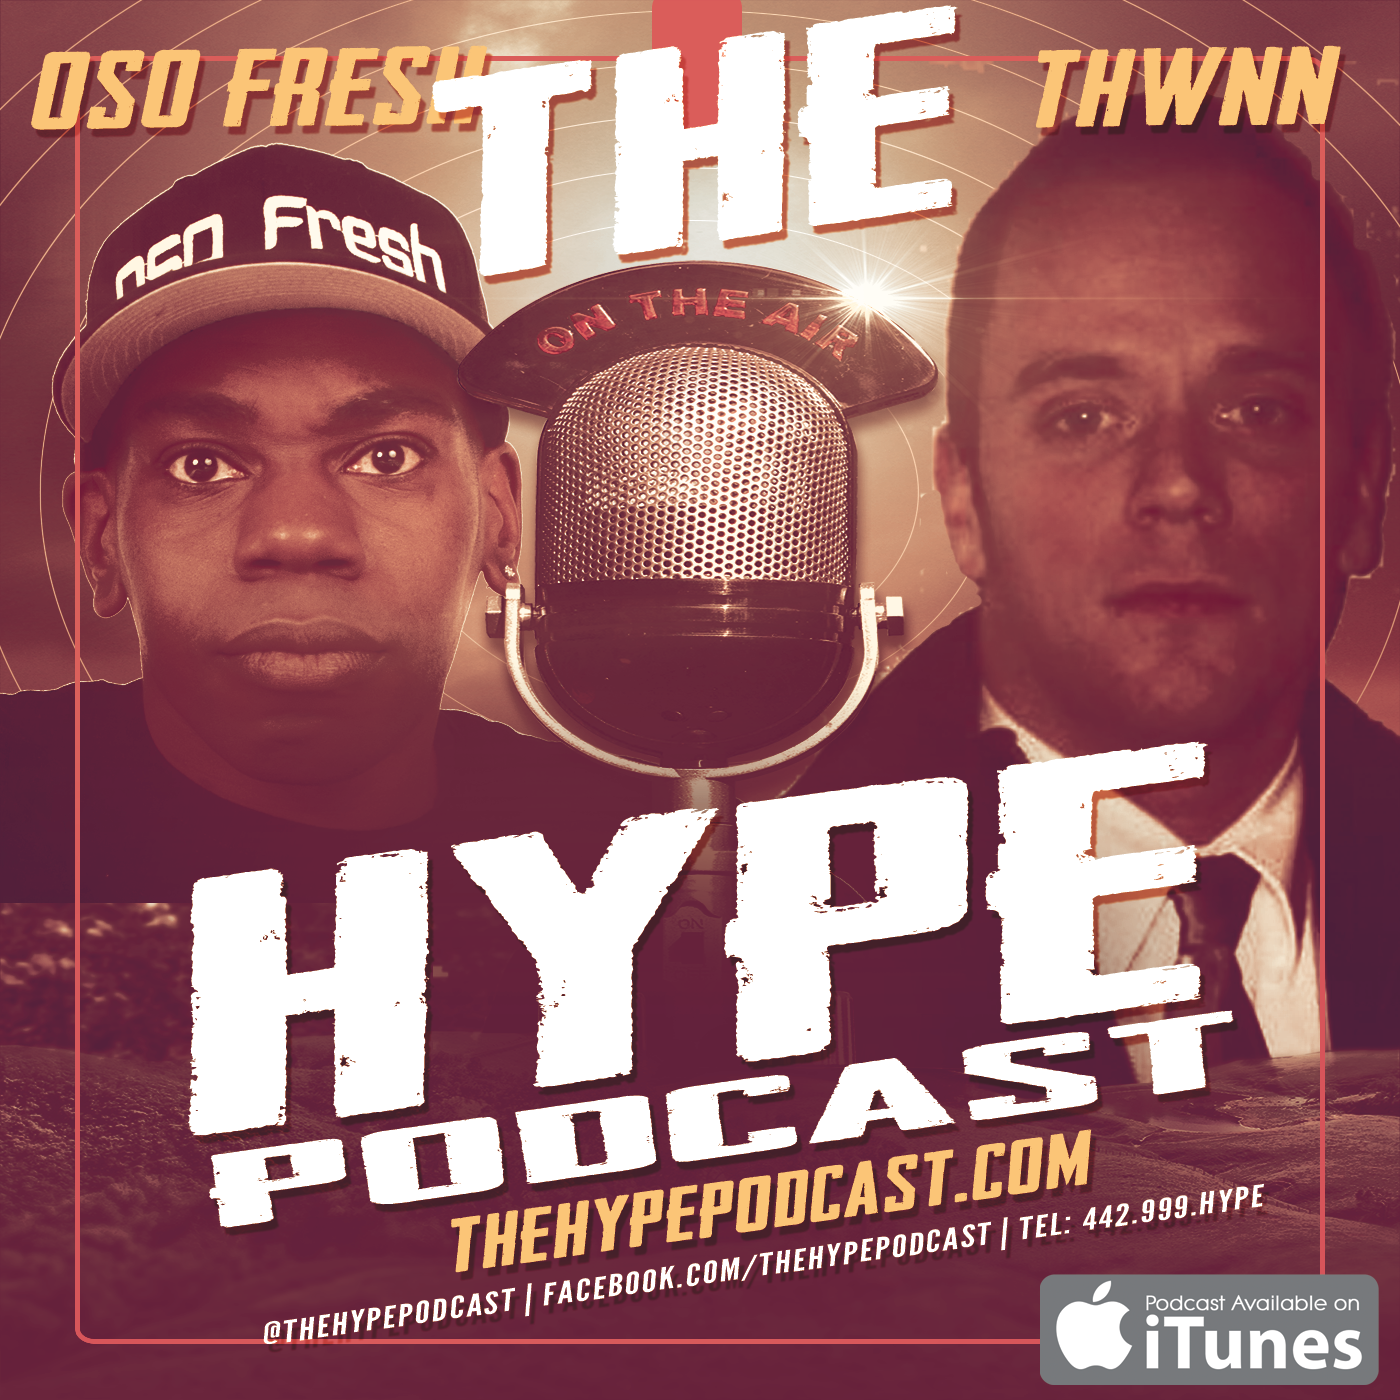 Artwork for hype podcast episode 1001